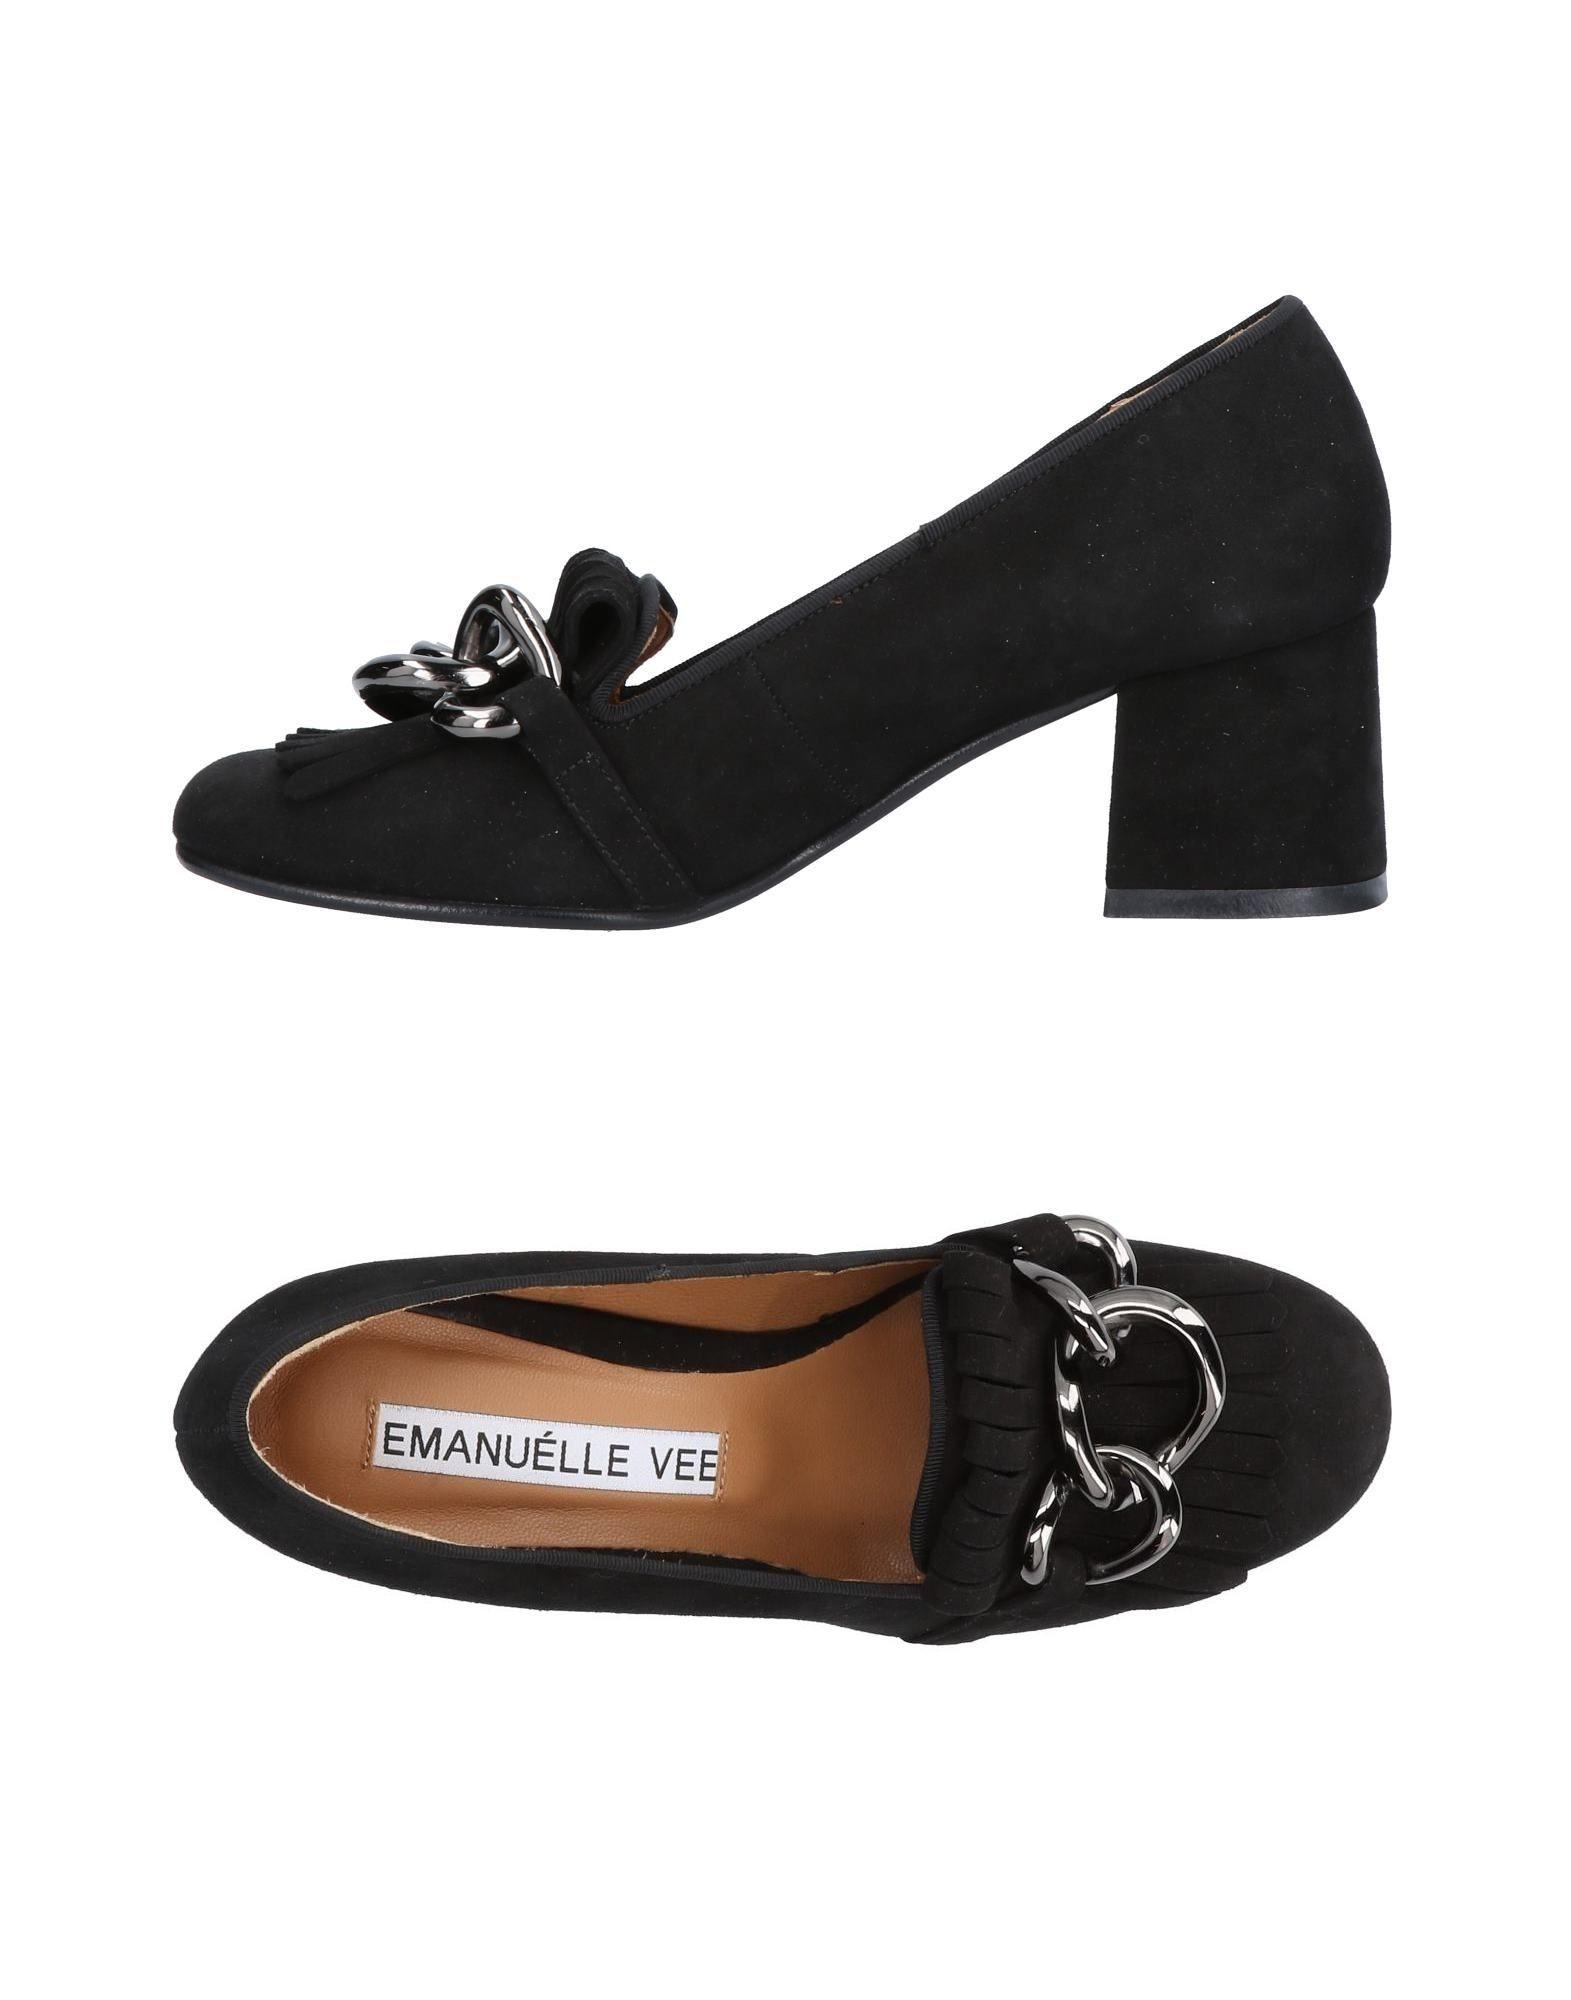 Emanuélle Vee Mokassins Damen  11493946KB Gute Qualität beliebte Schuhe